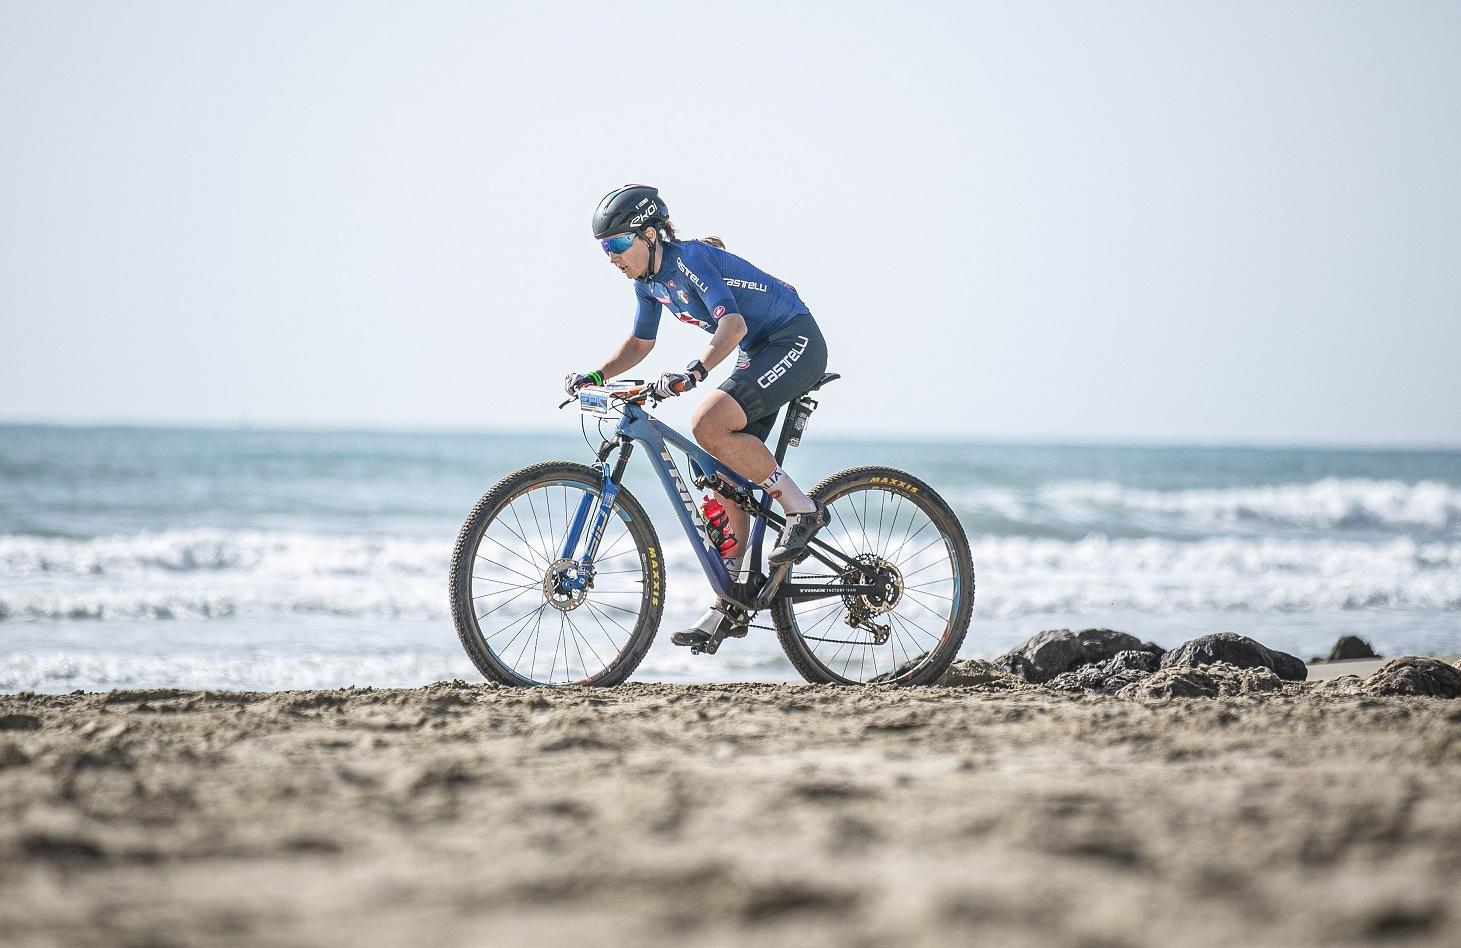 MEDITERRANEAN EPIC 2021 – Jaroslav Kulhavy & Martina Berta gewinnen letzte Etappe